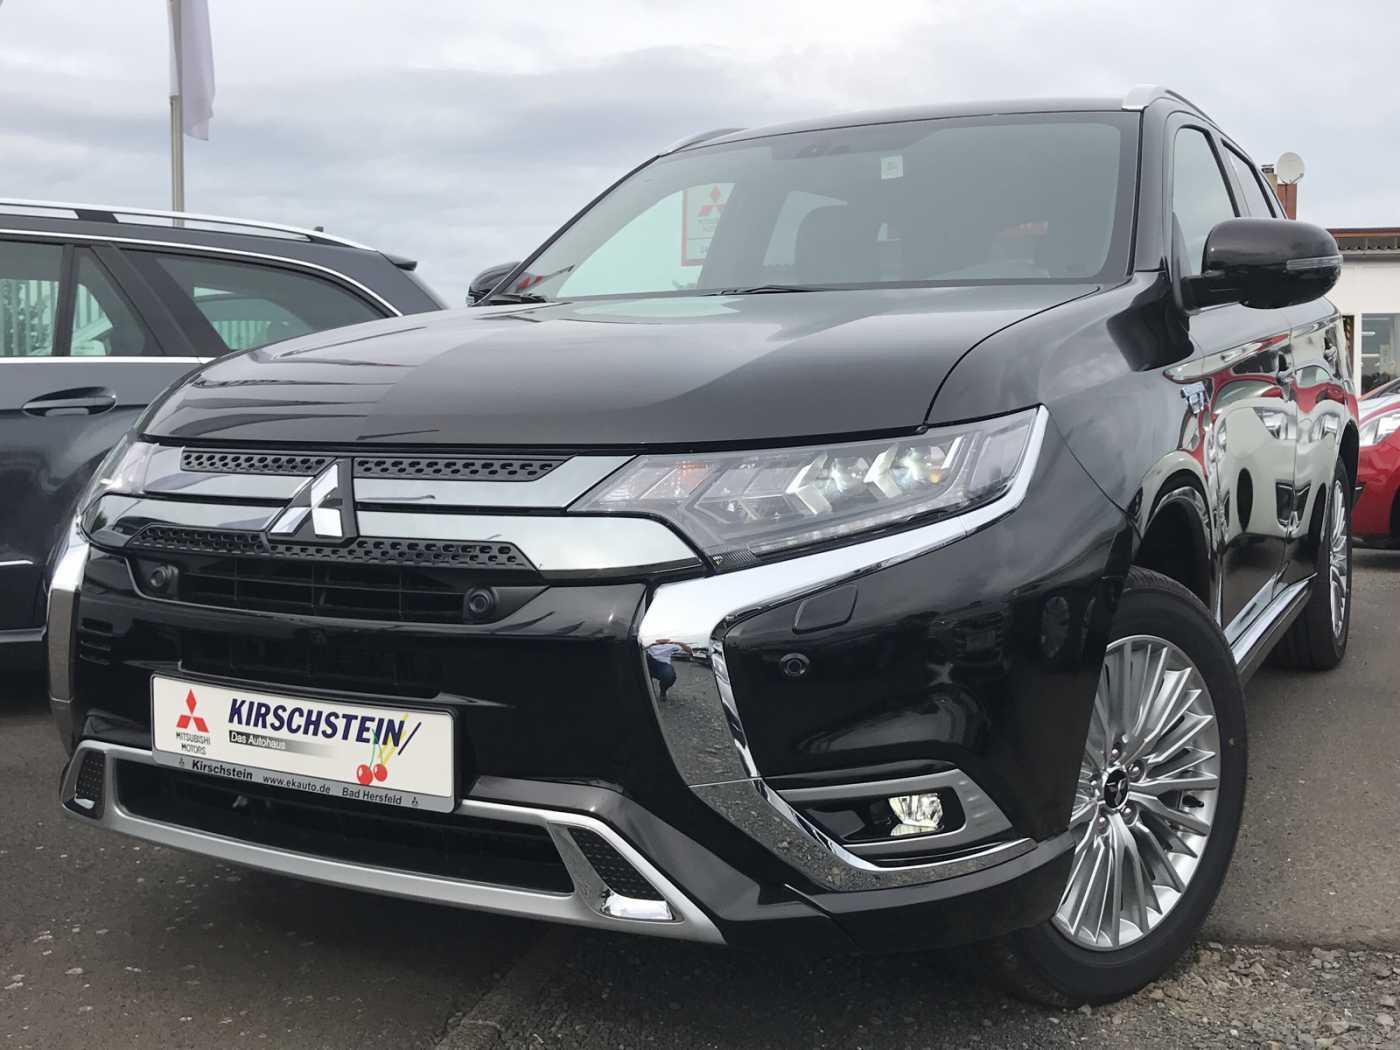 Mitsubishi Plug-in Hybrid Outlander 2.4 Intro WR Navi Standheizung, Jahr 2019, Elektro